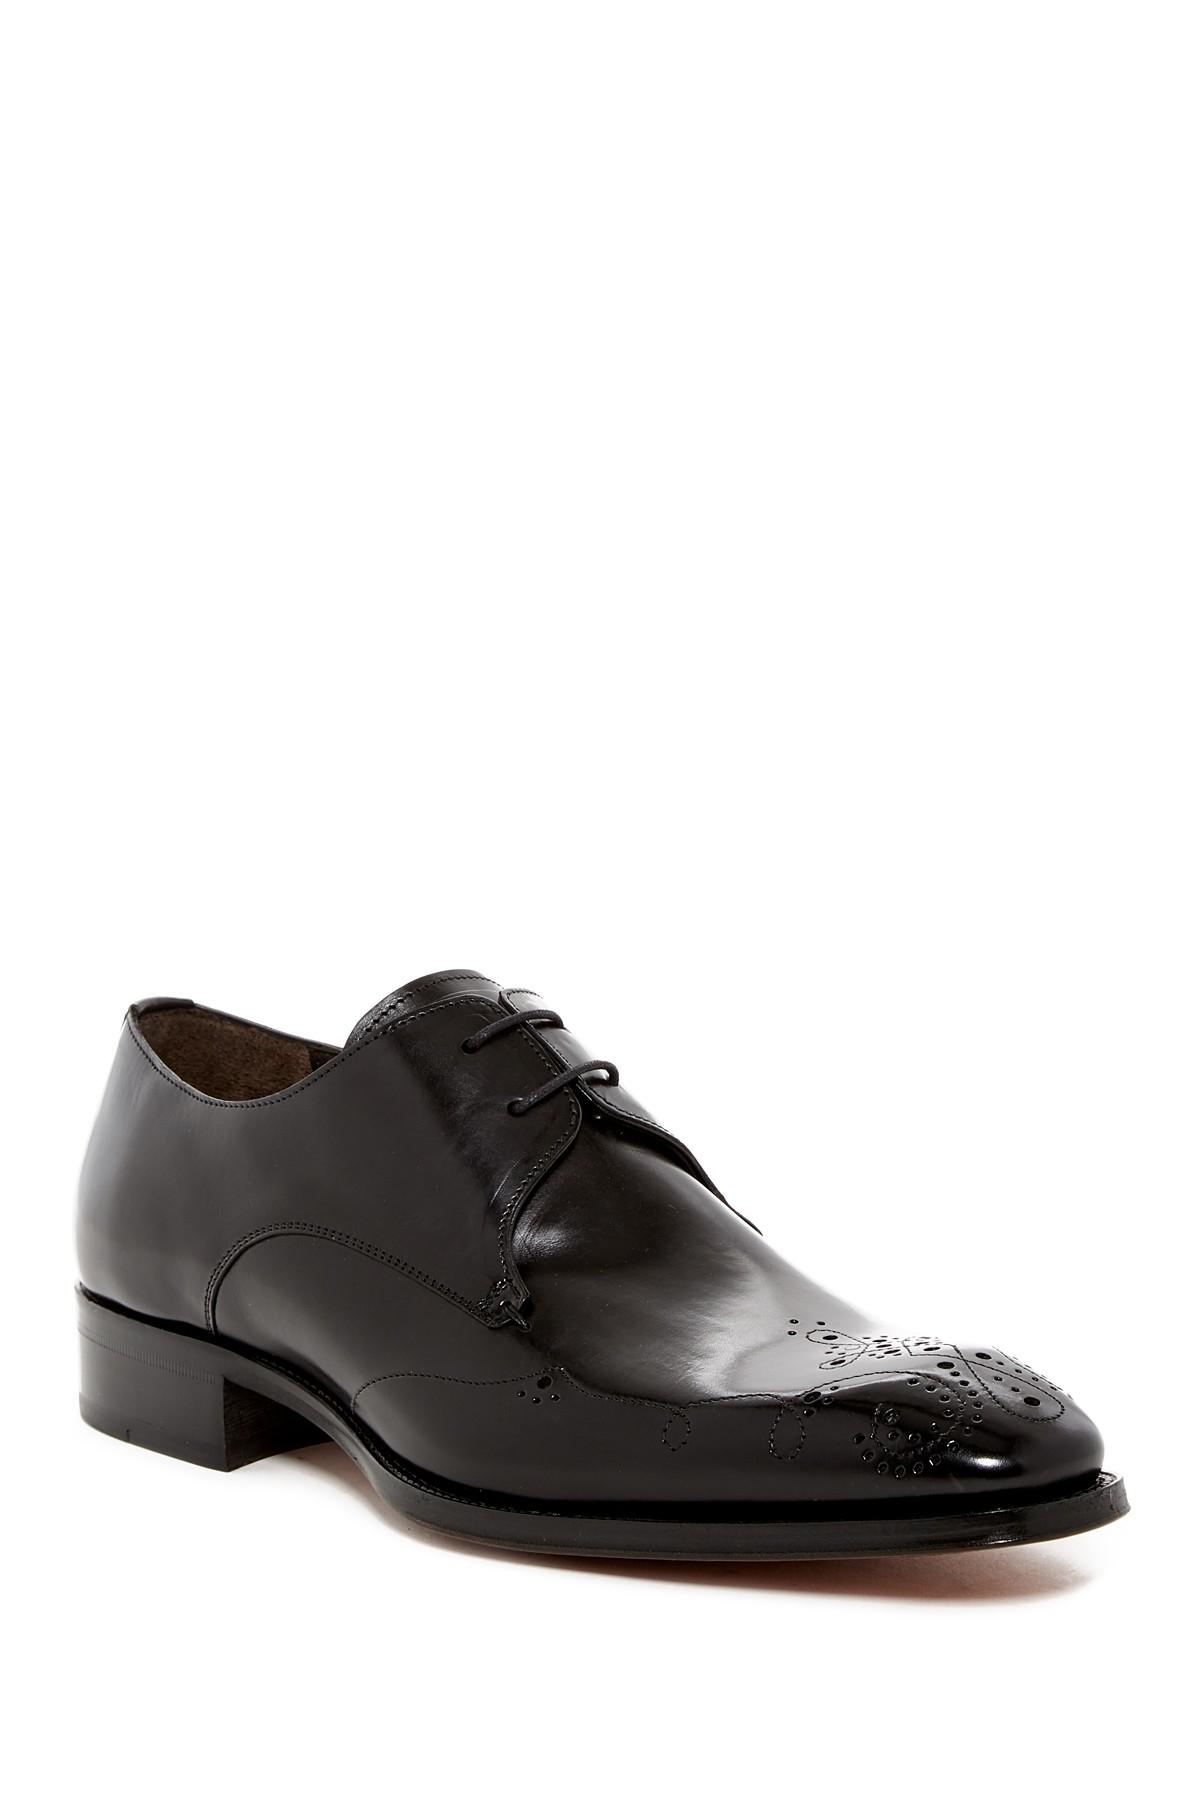 Mezlan Shoes New York